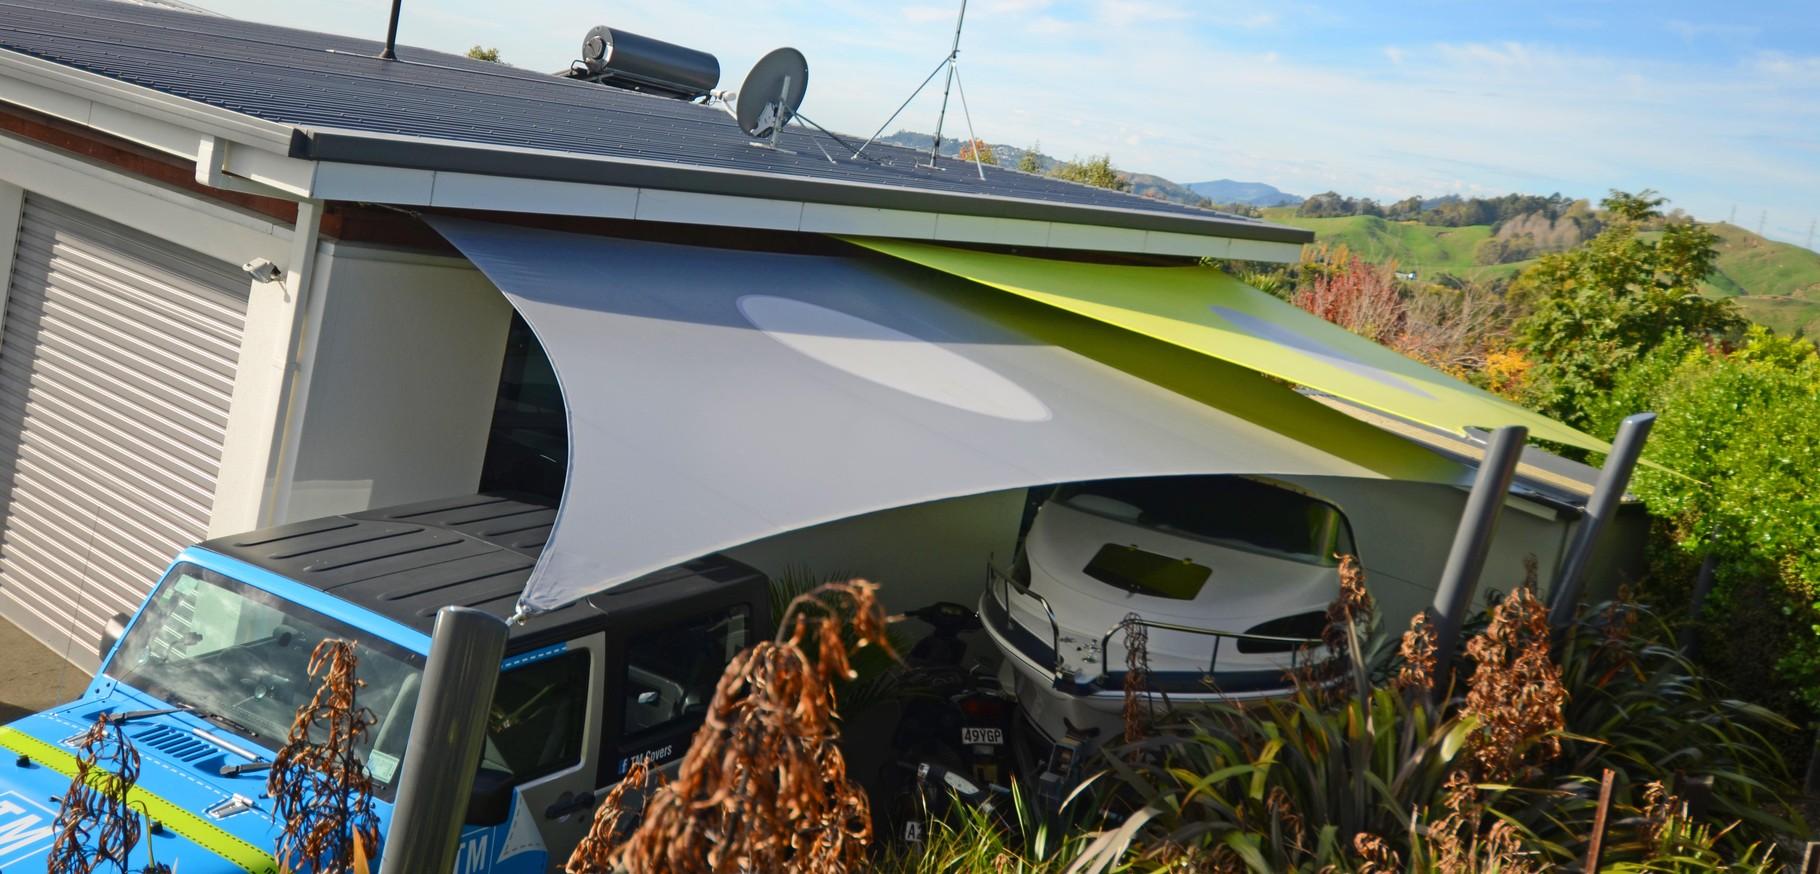 Shade Sails, Richmond, Nelson, New Zealand